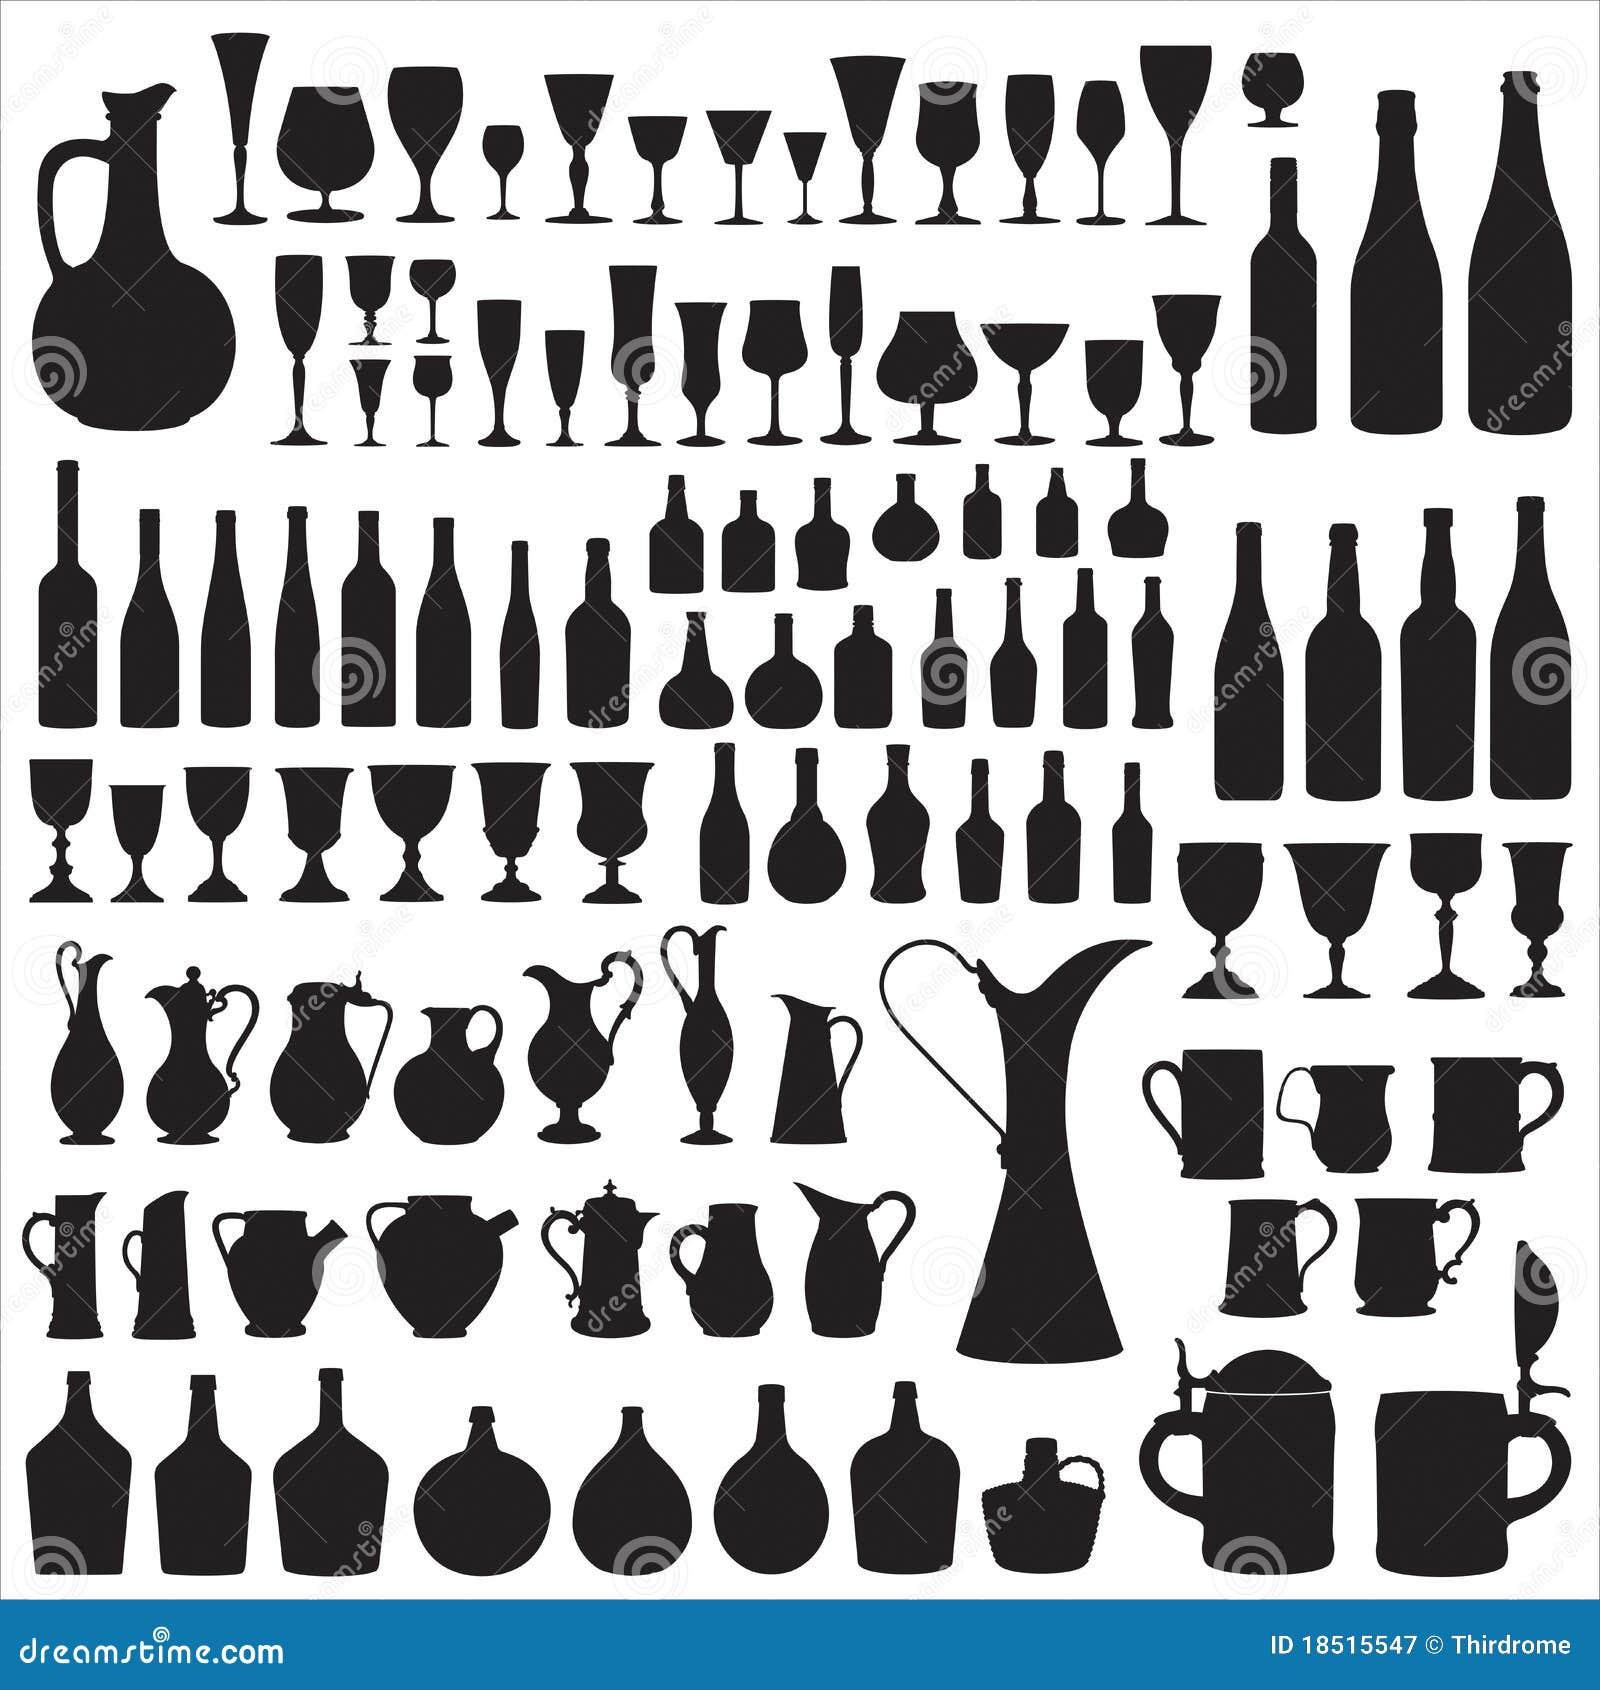 Silhouettes wineware